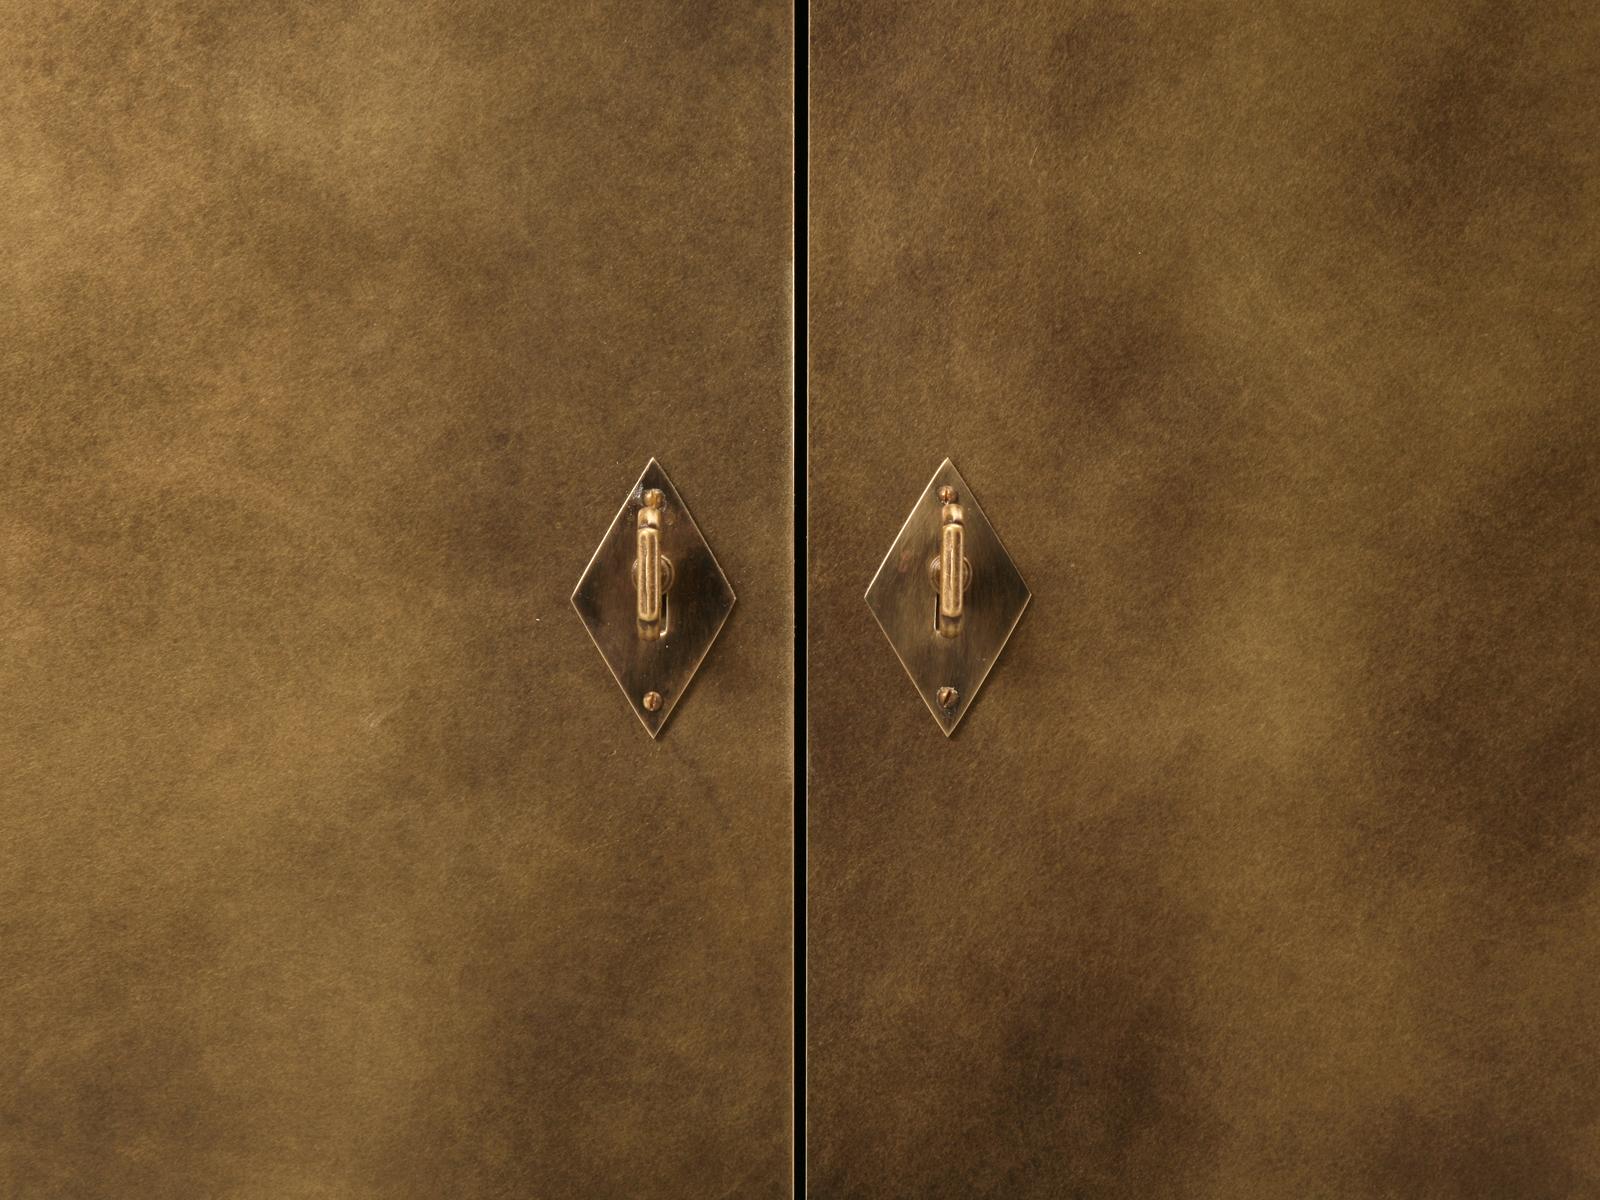 Metal Textured Furniture